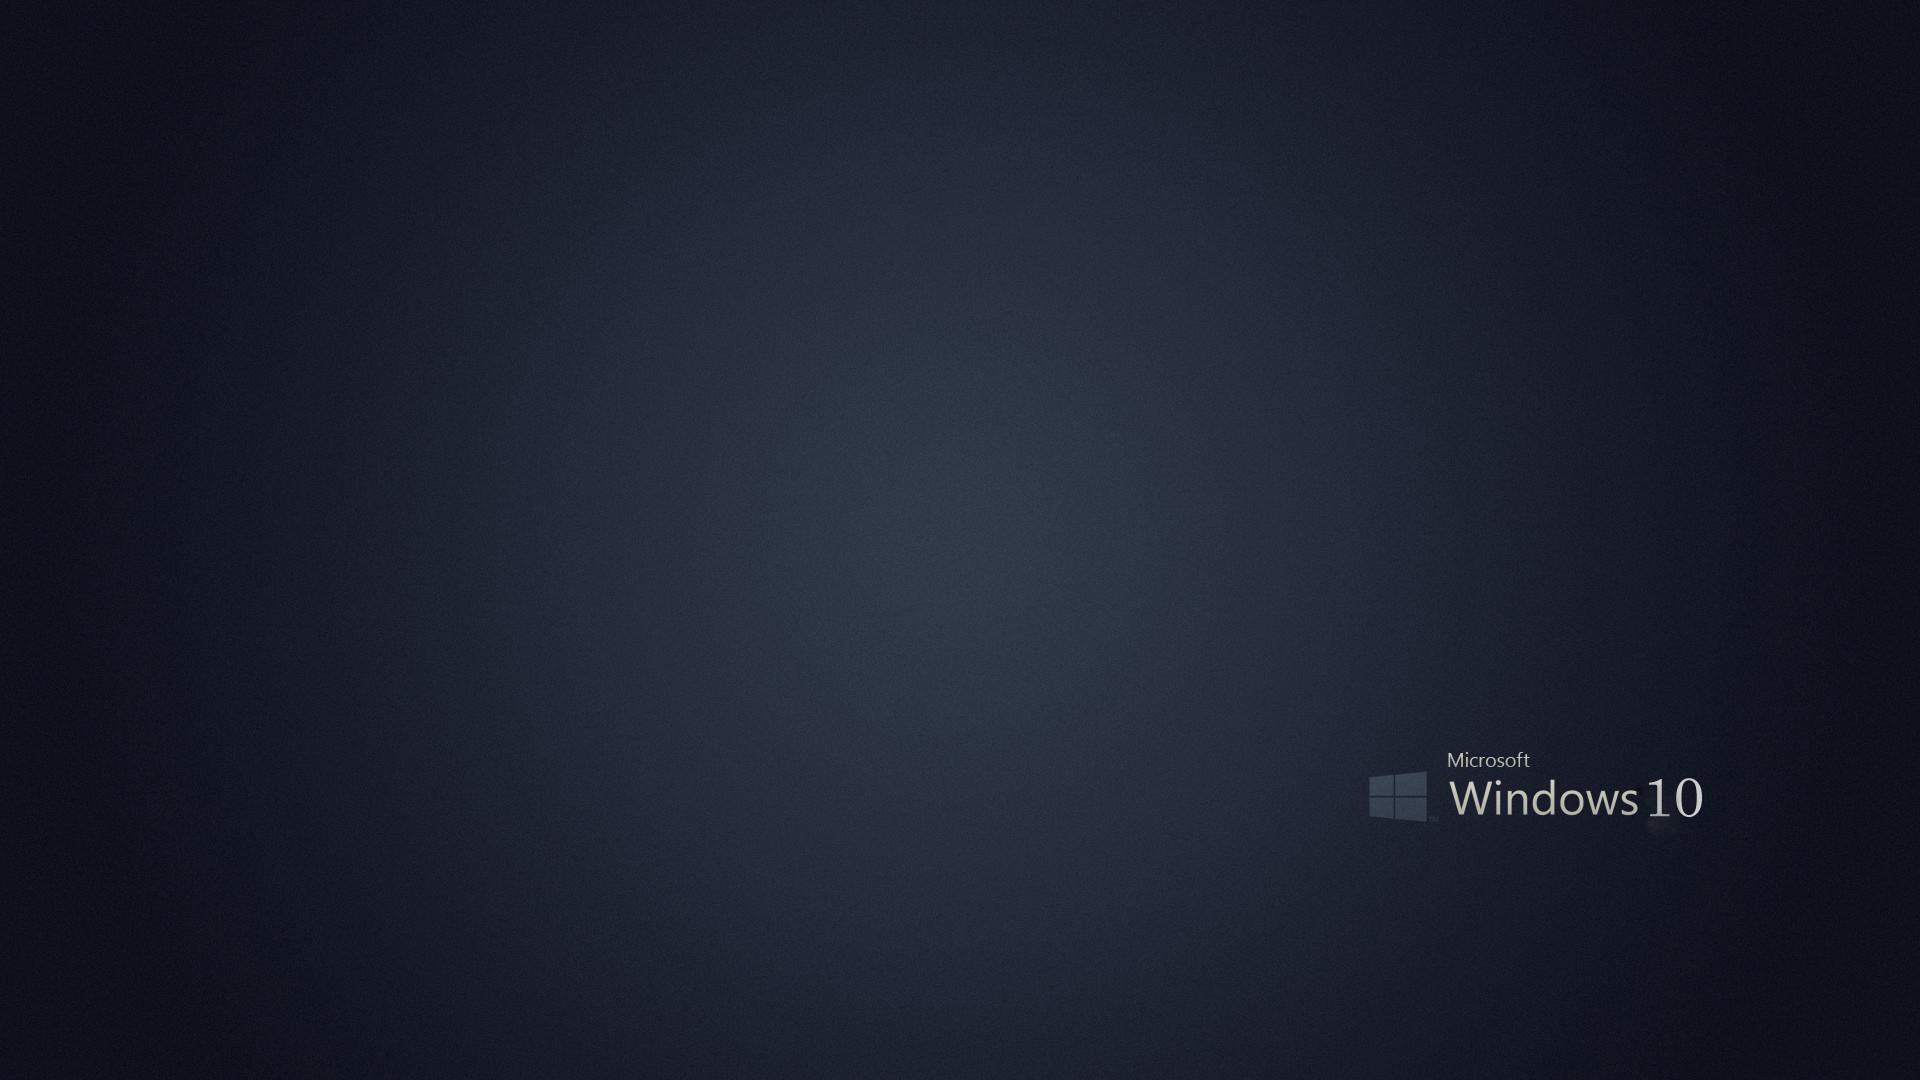 Cool Dark Windows 10 Wallpaper Wallpaper